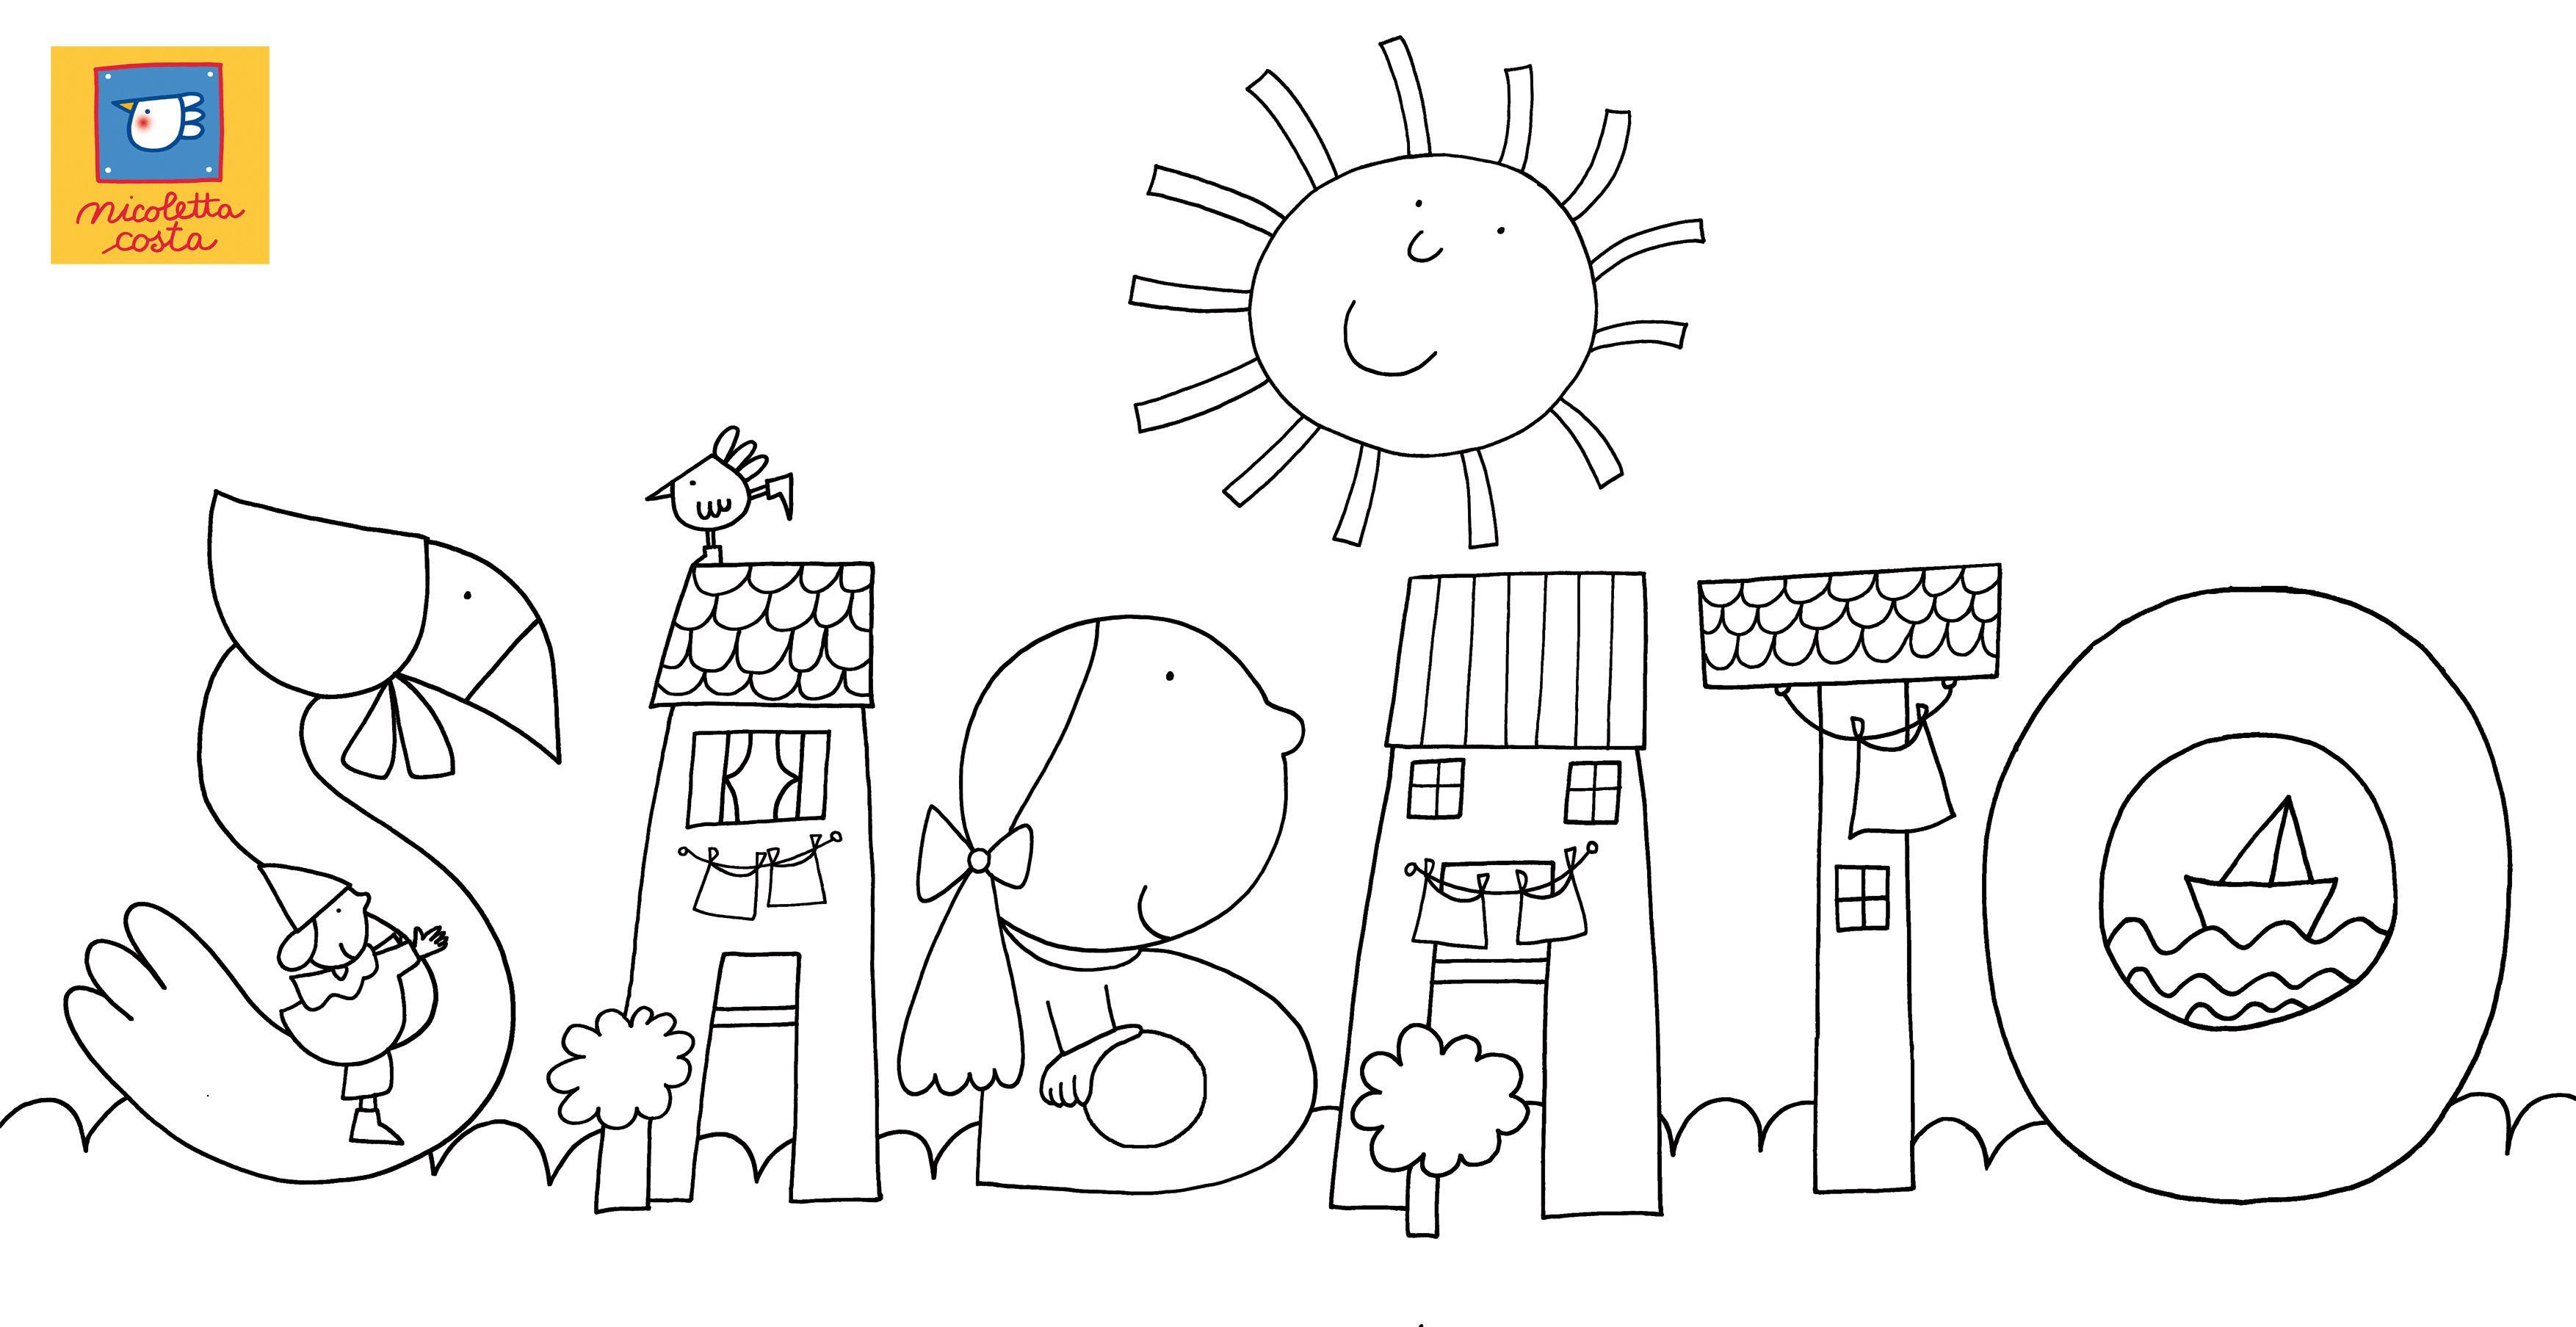 Pin von Cristina Sénica auf Desenhos para colorir | Pinterest